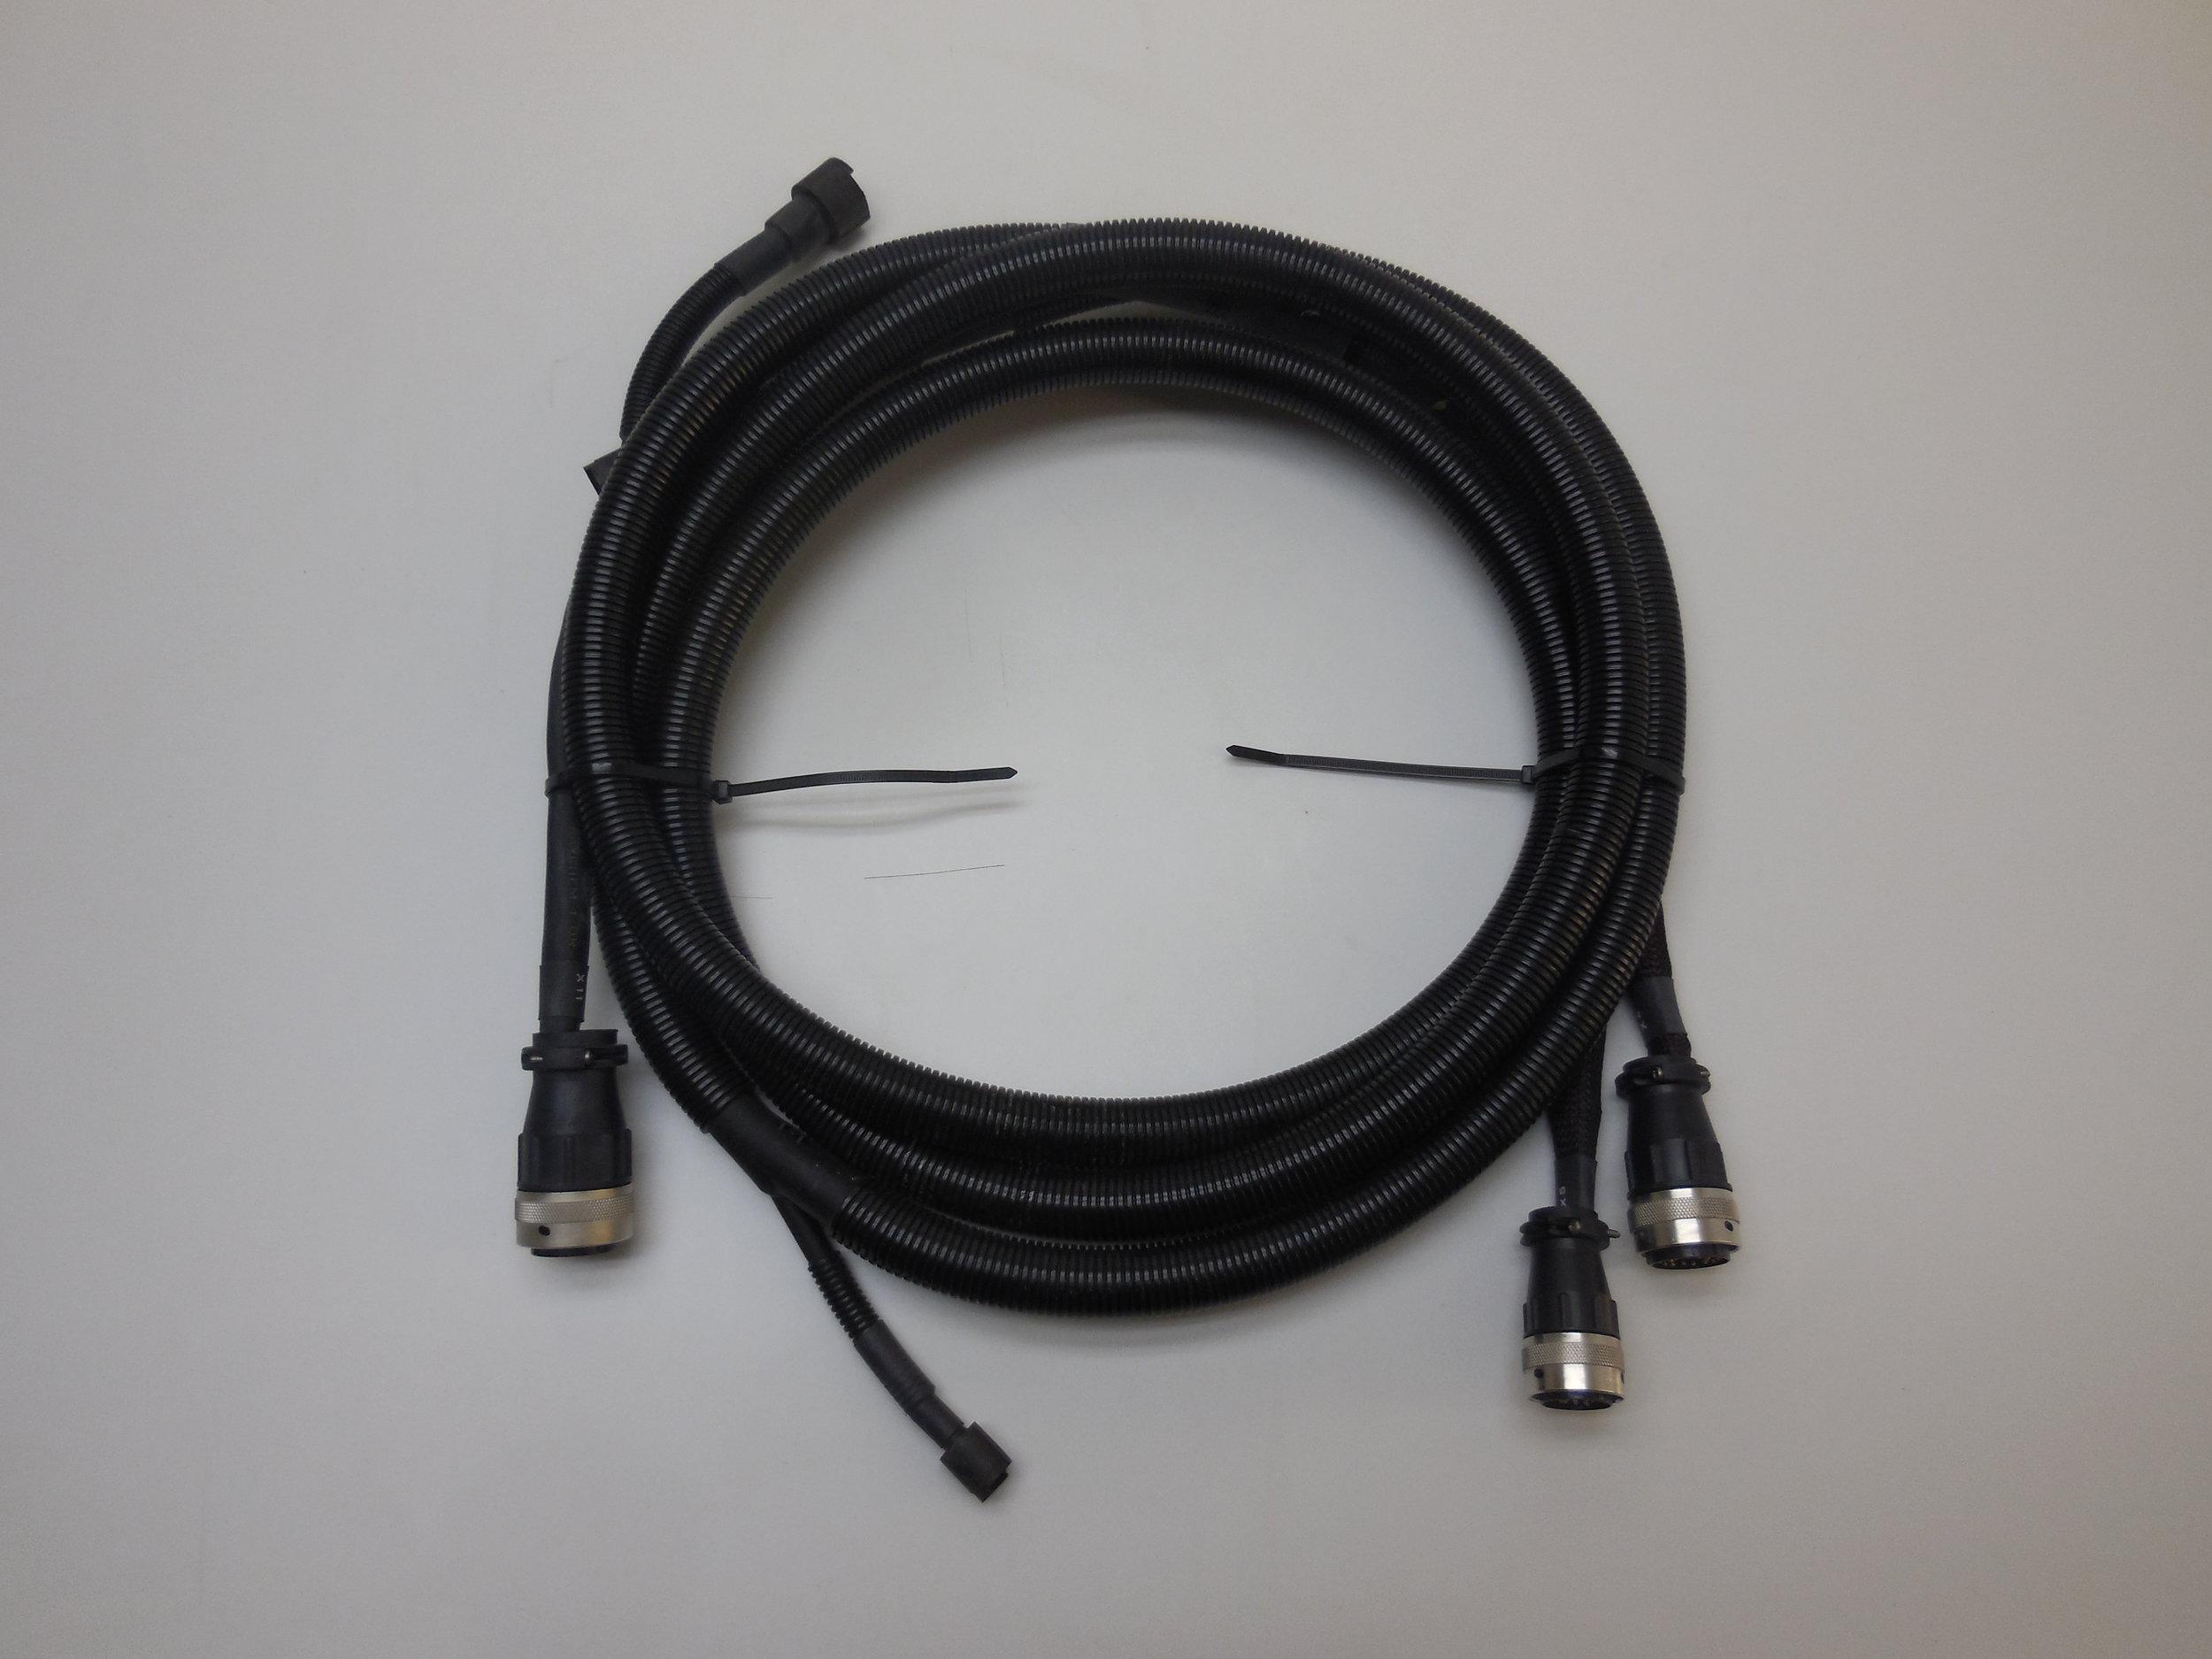 Cable 2, cabling sparepart bv   Häggo nr: 20006-110   Price: